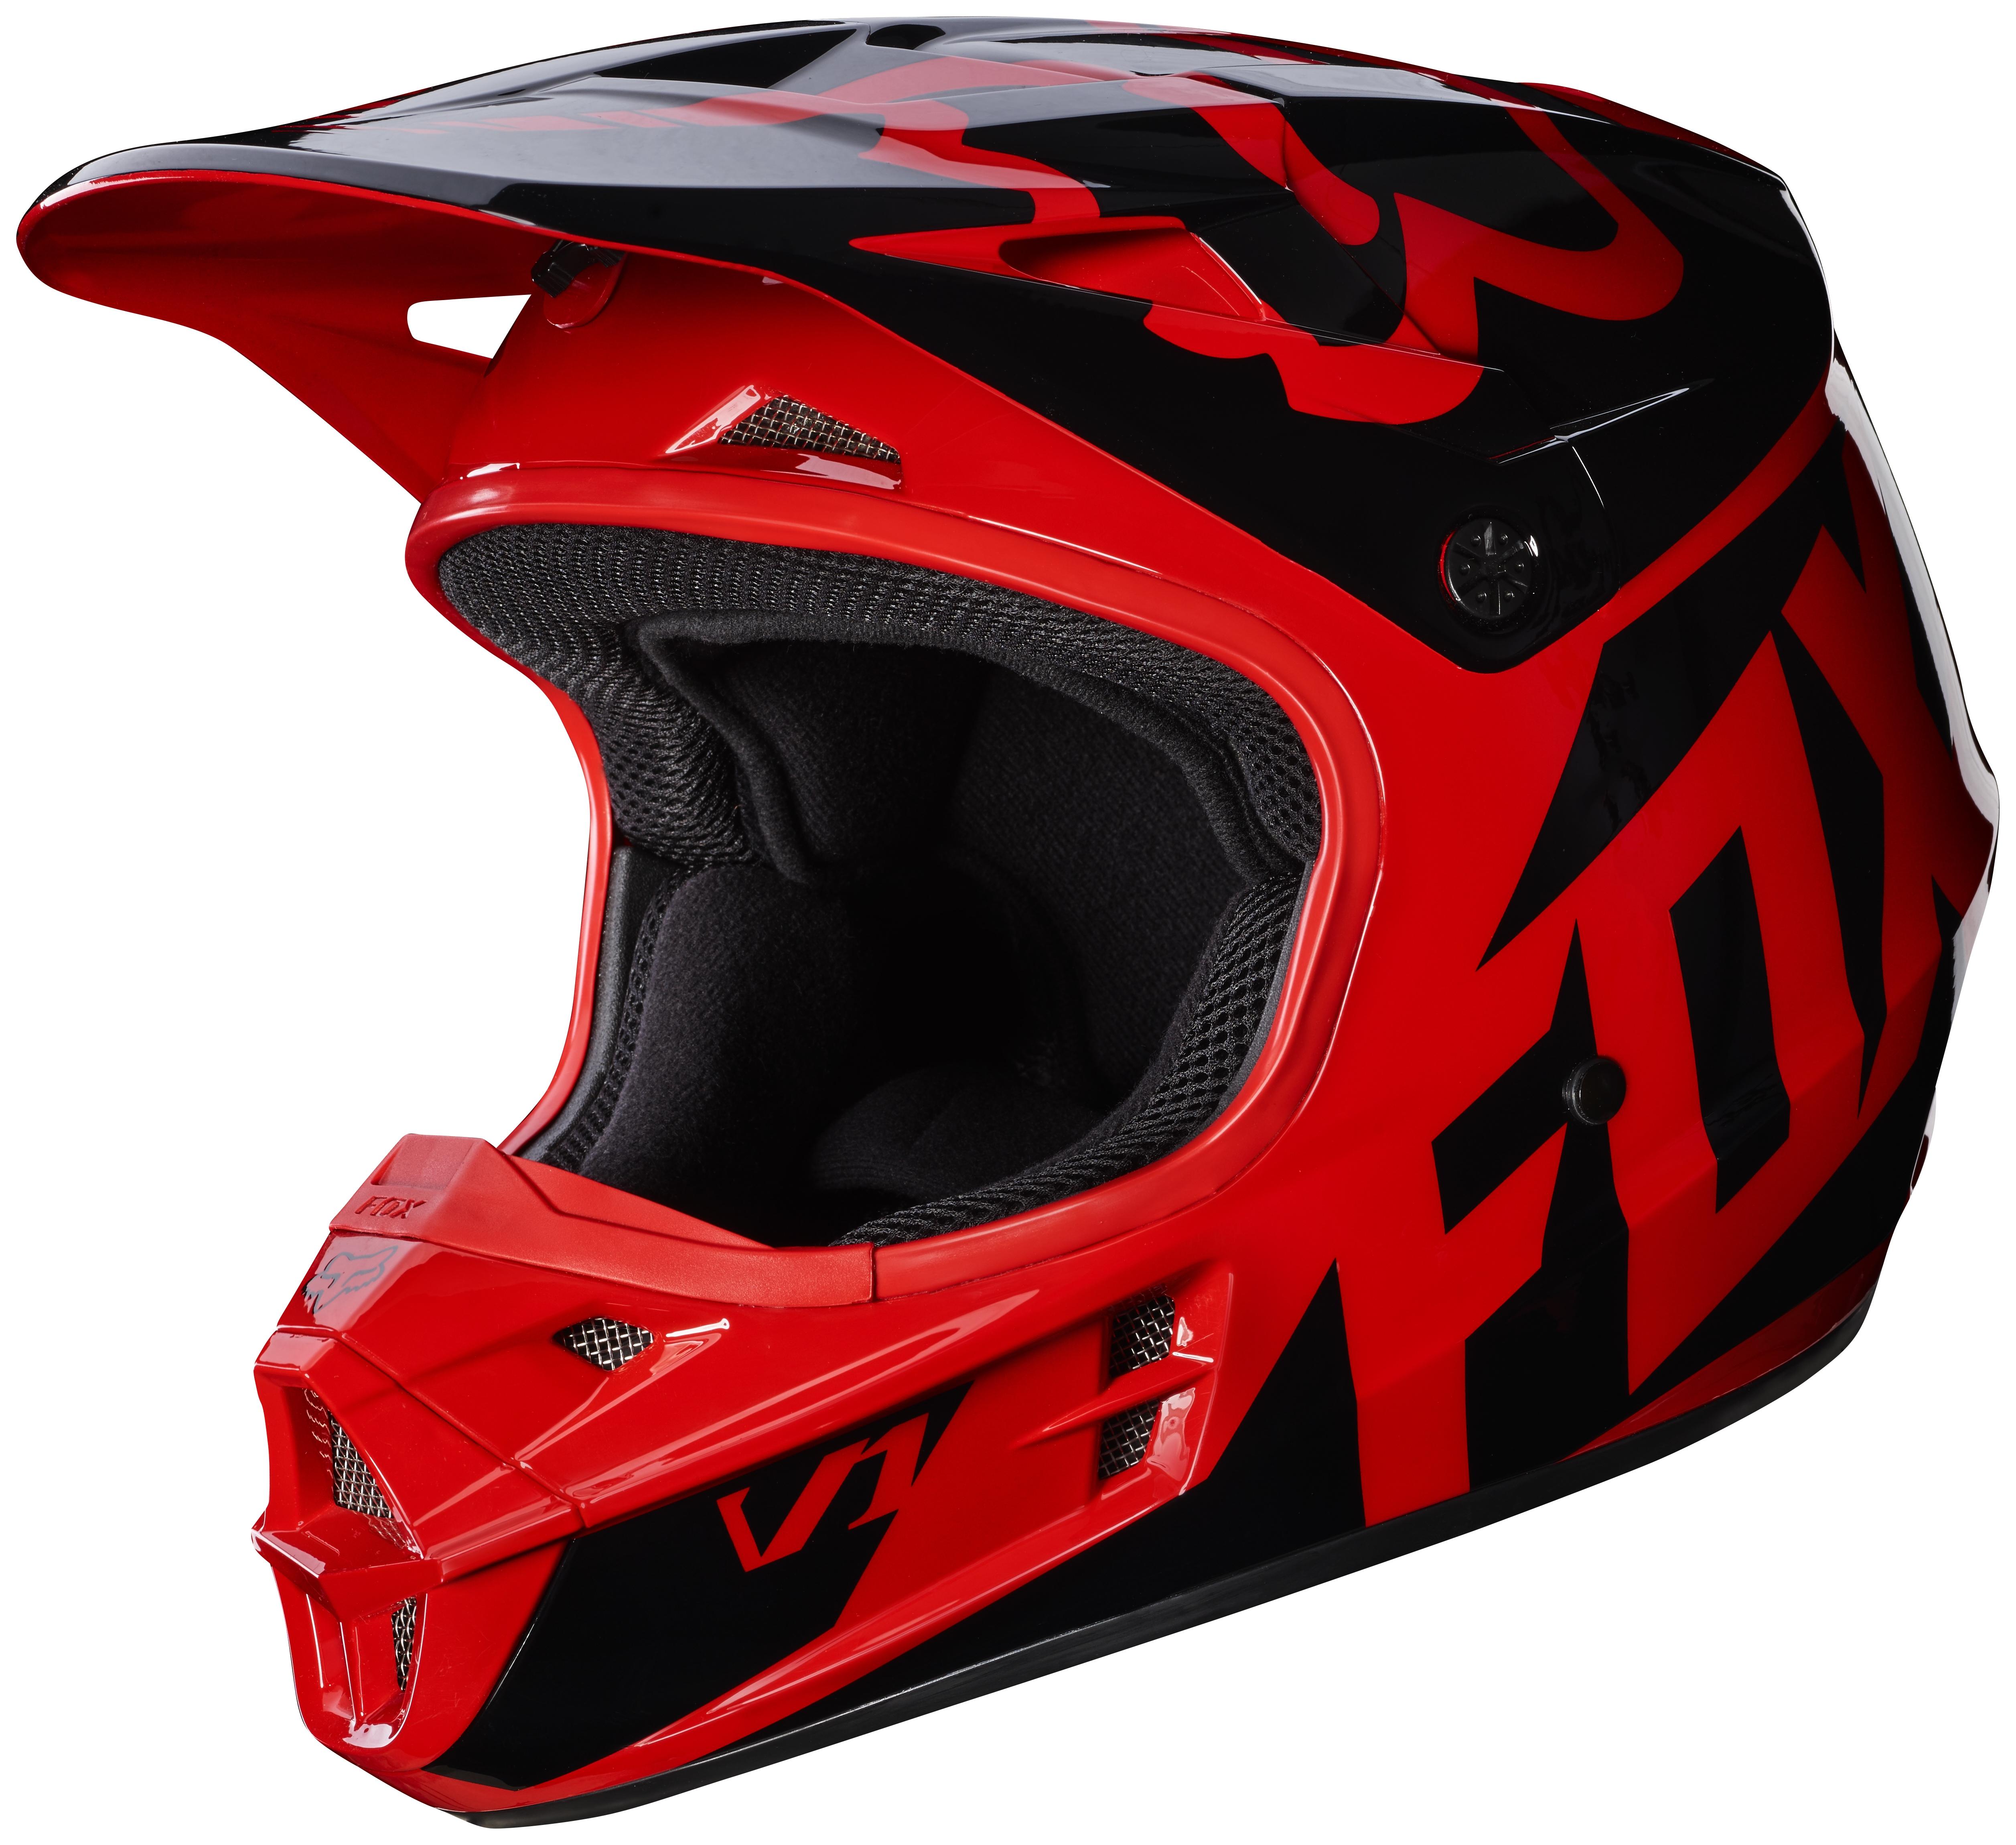 fox racing v1 race helmet 25 off revzilla. Black Bedroom Furniture Sets. Home Design Ideas